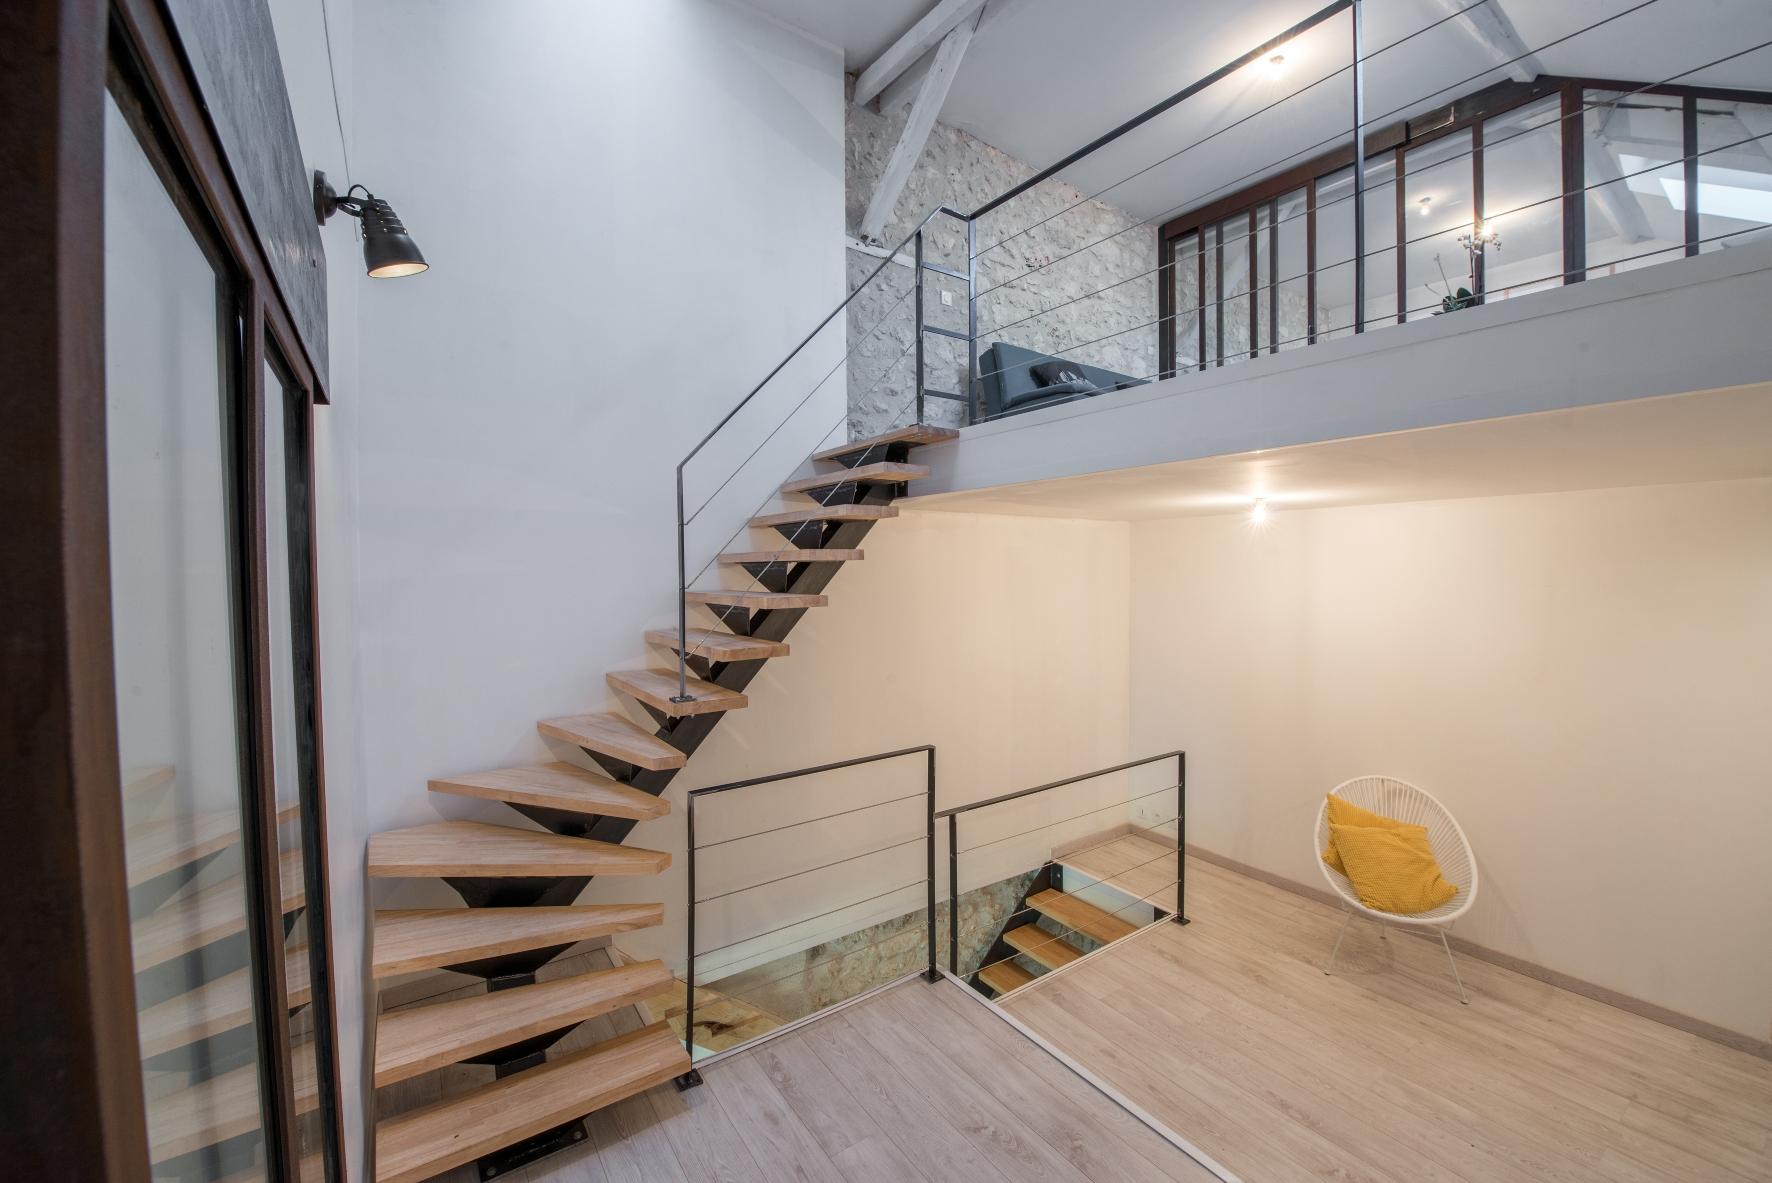 Escalier Jach fer.jpg